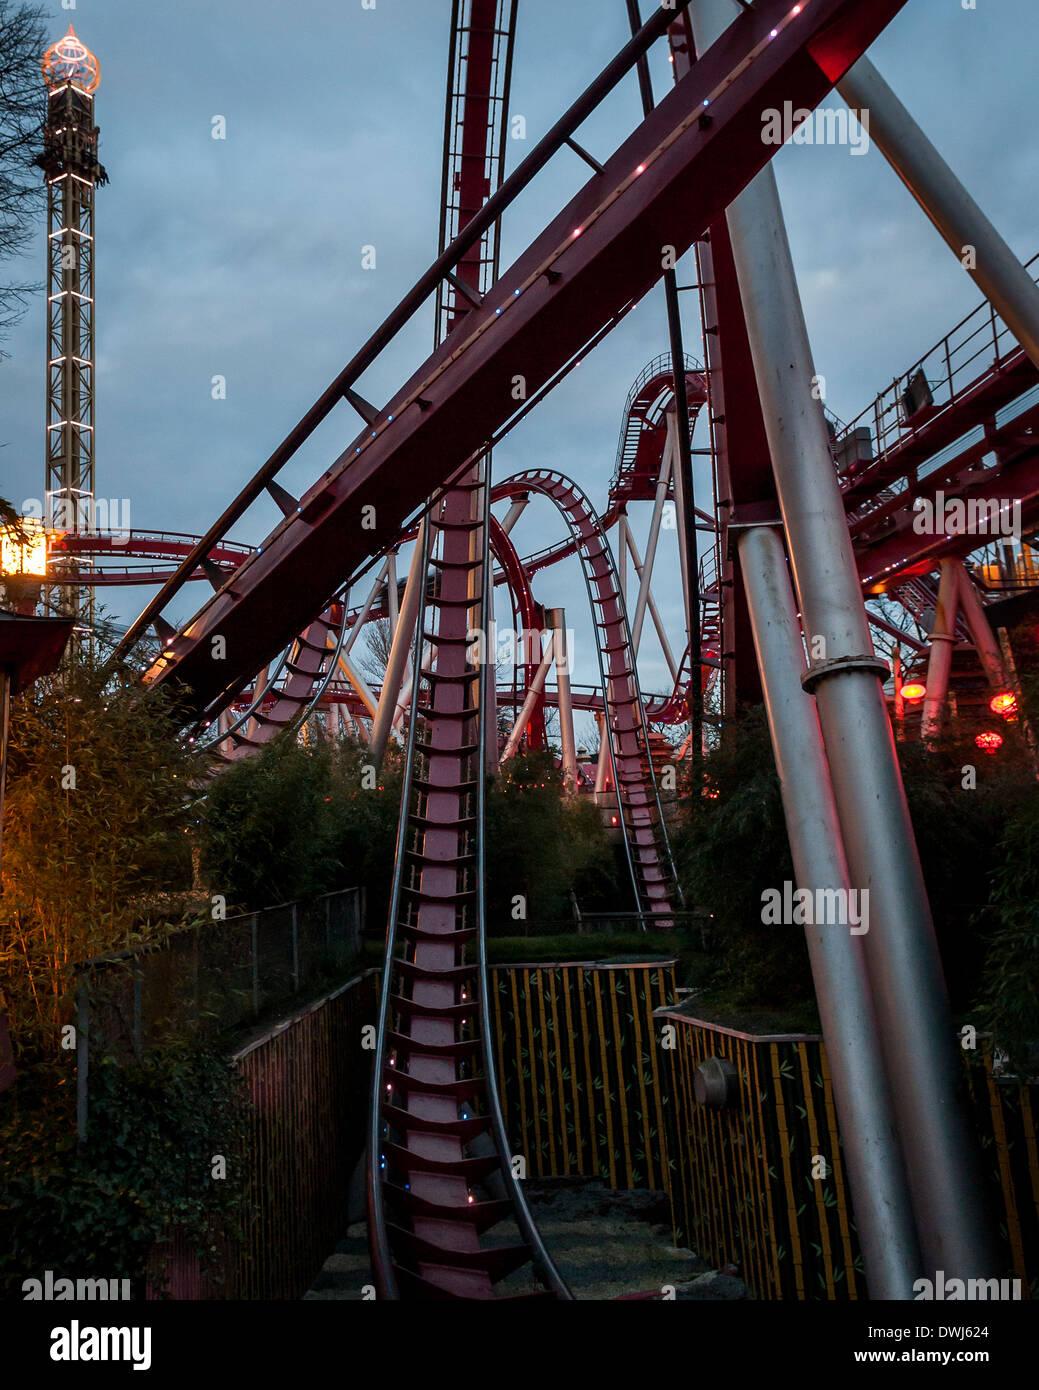 Tivoli Gardens, Copenhagen, Denmark. Architect: Various, 2014. The Demon Rollercoaster. Stock Photo